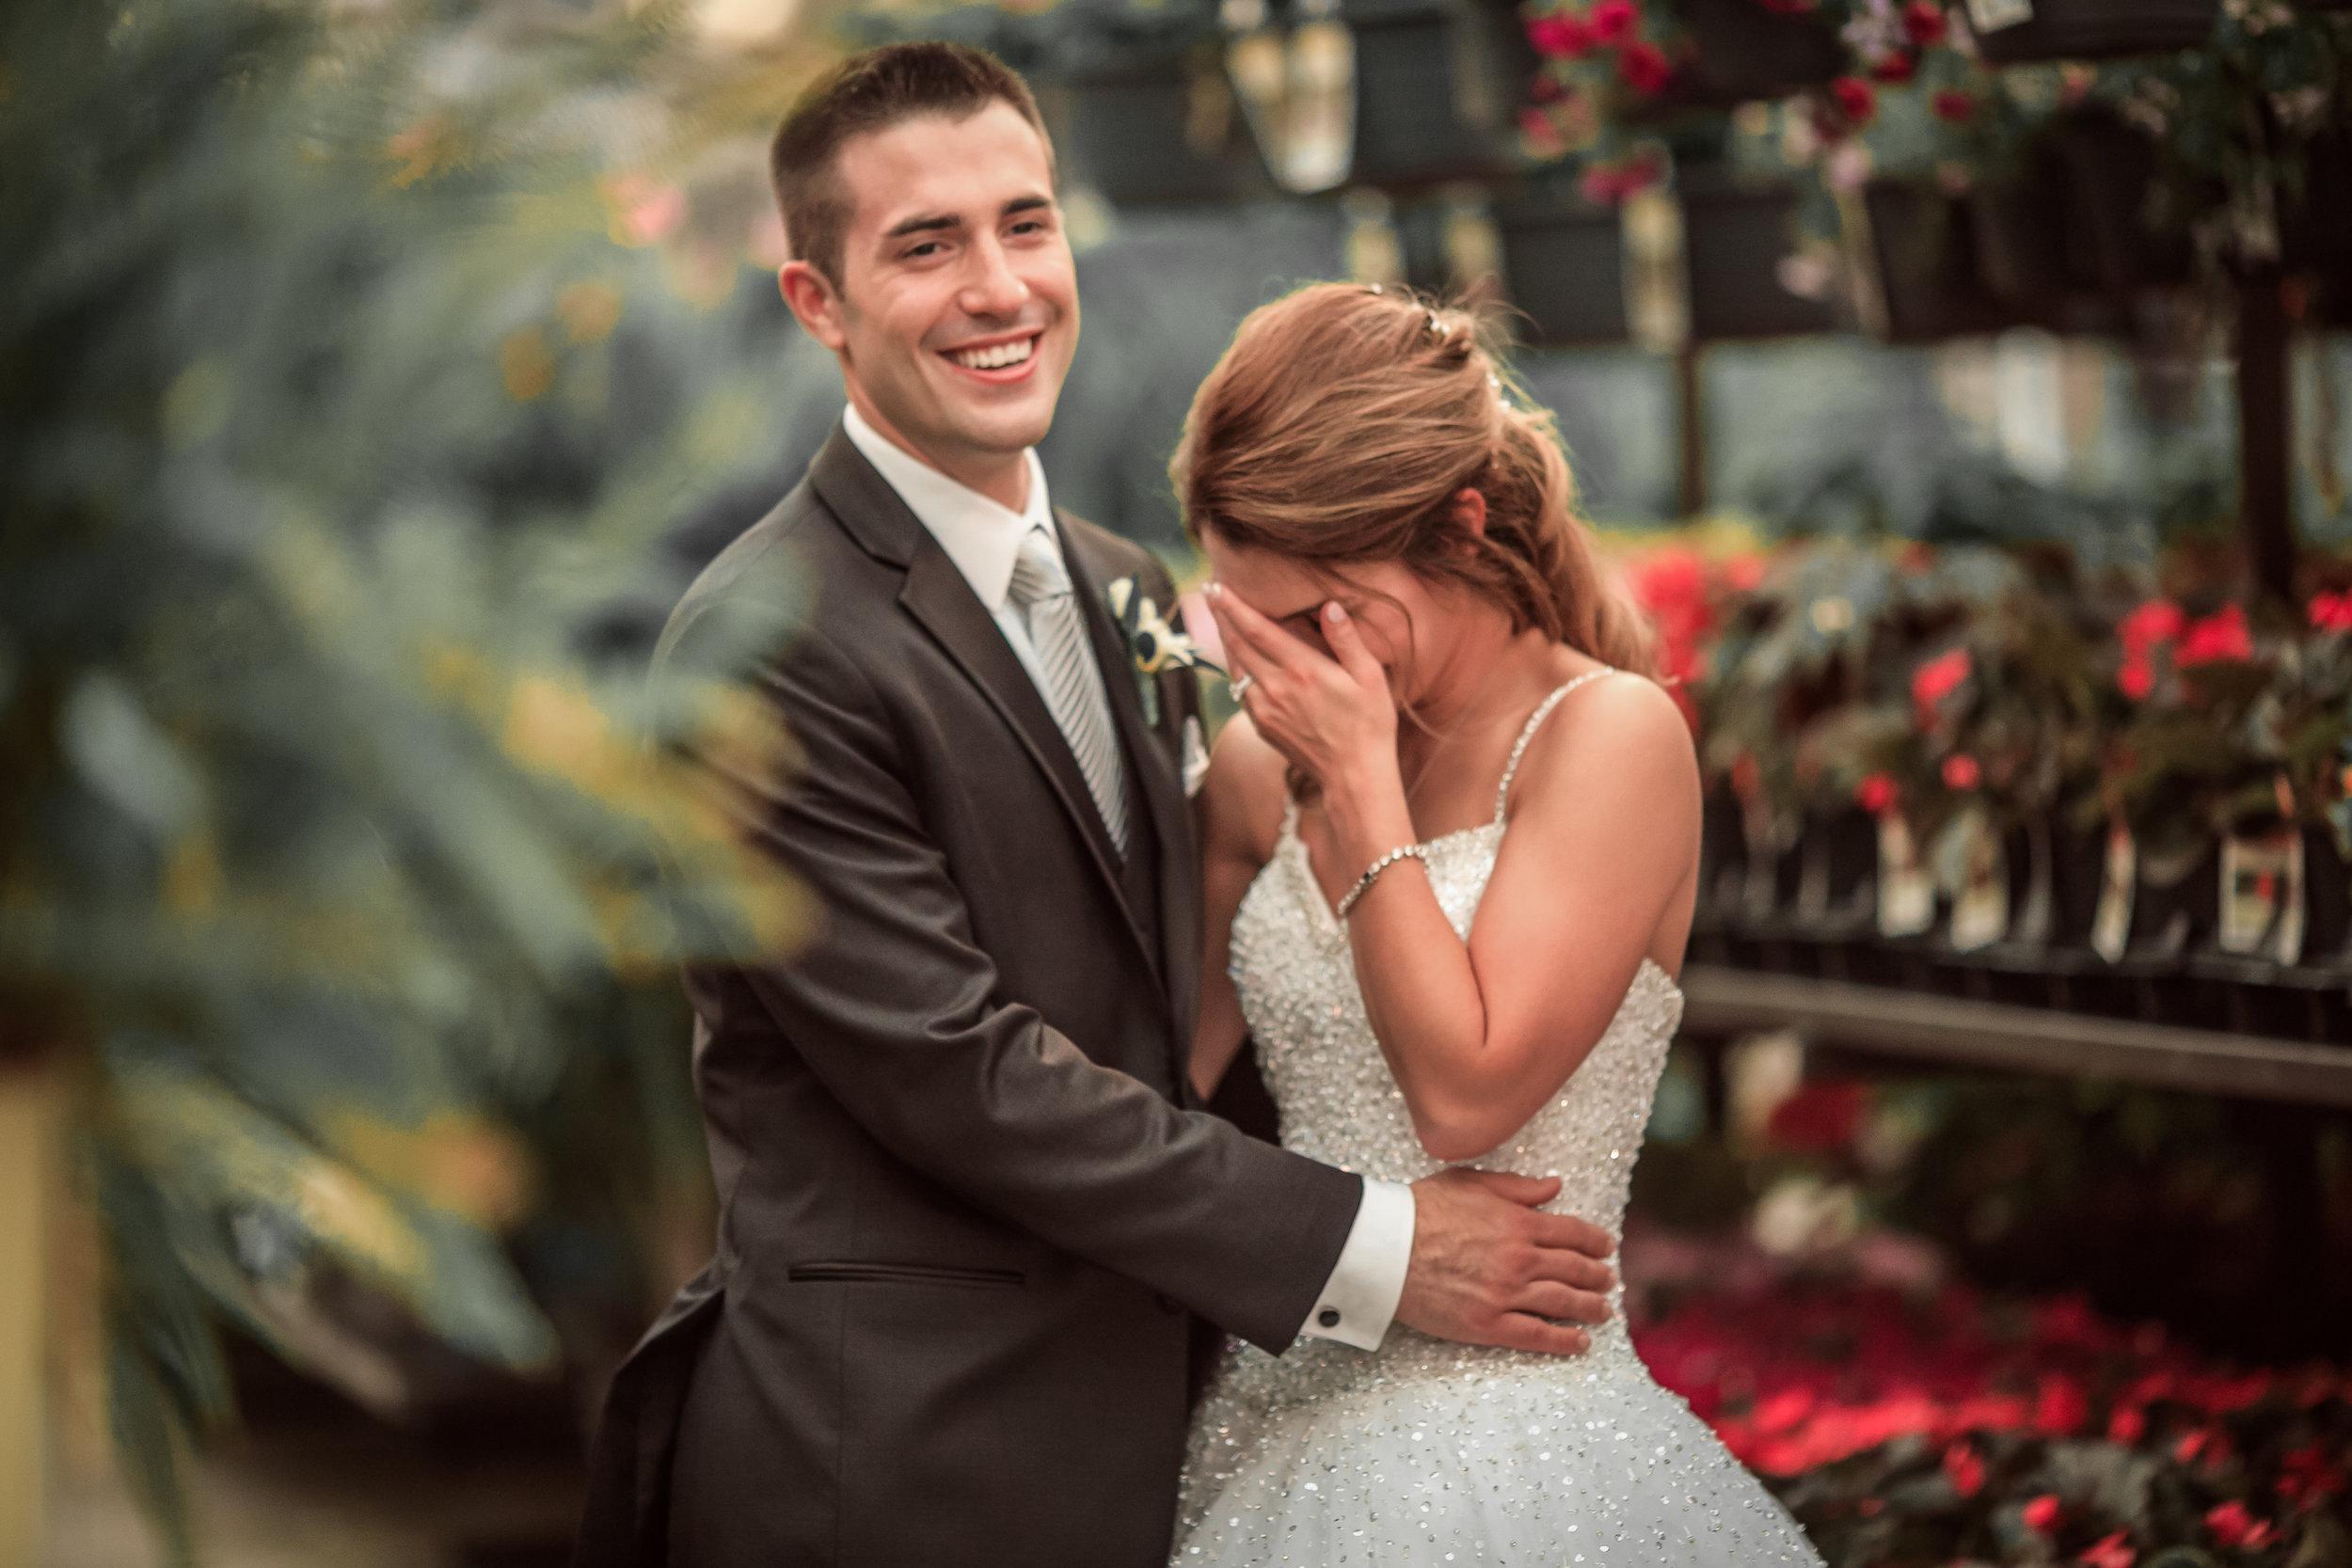 Wedding-couple-takes-photos-at-lowes-hardware-due-to-rain16.jpg